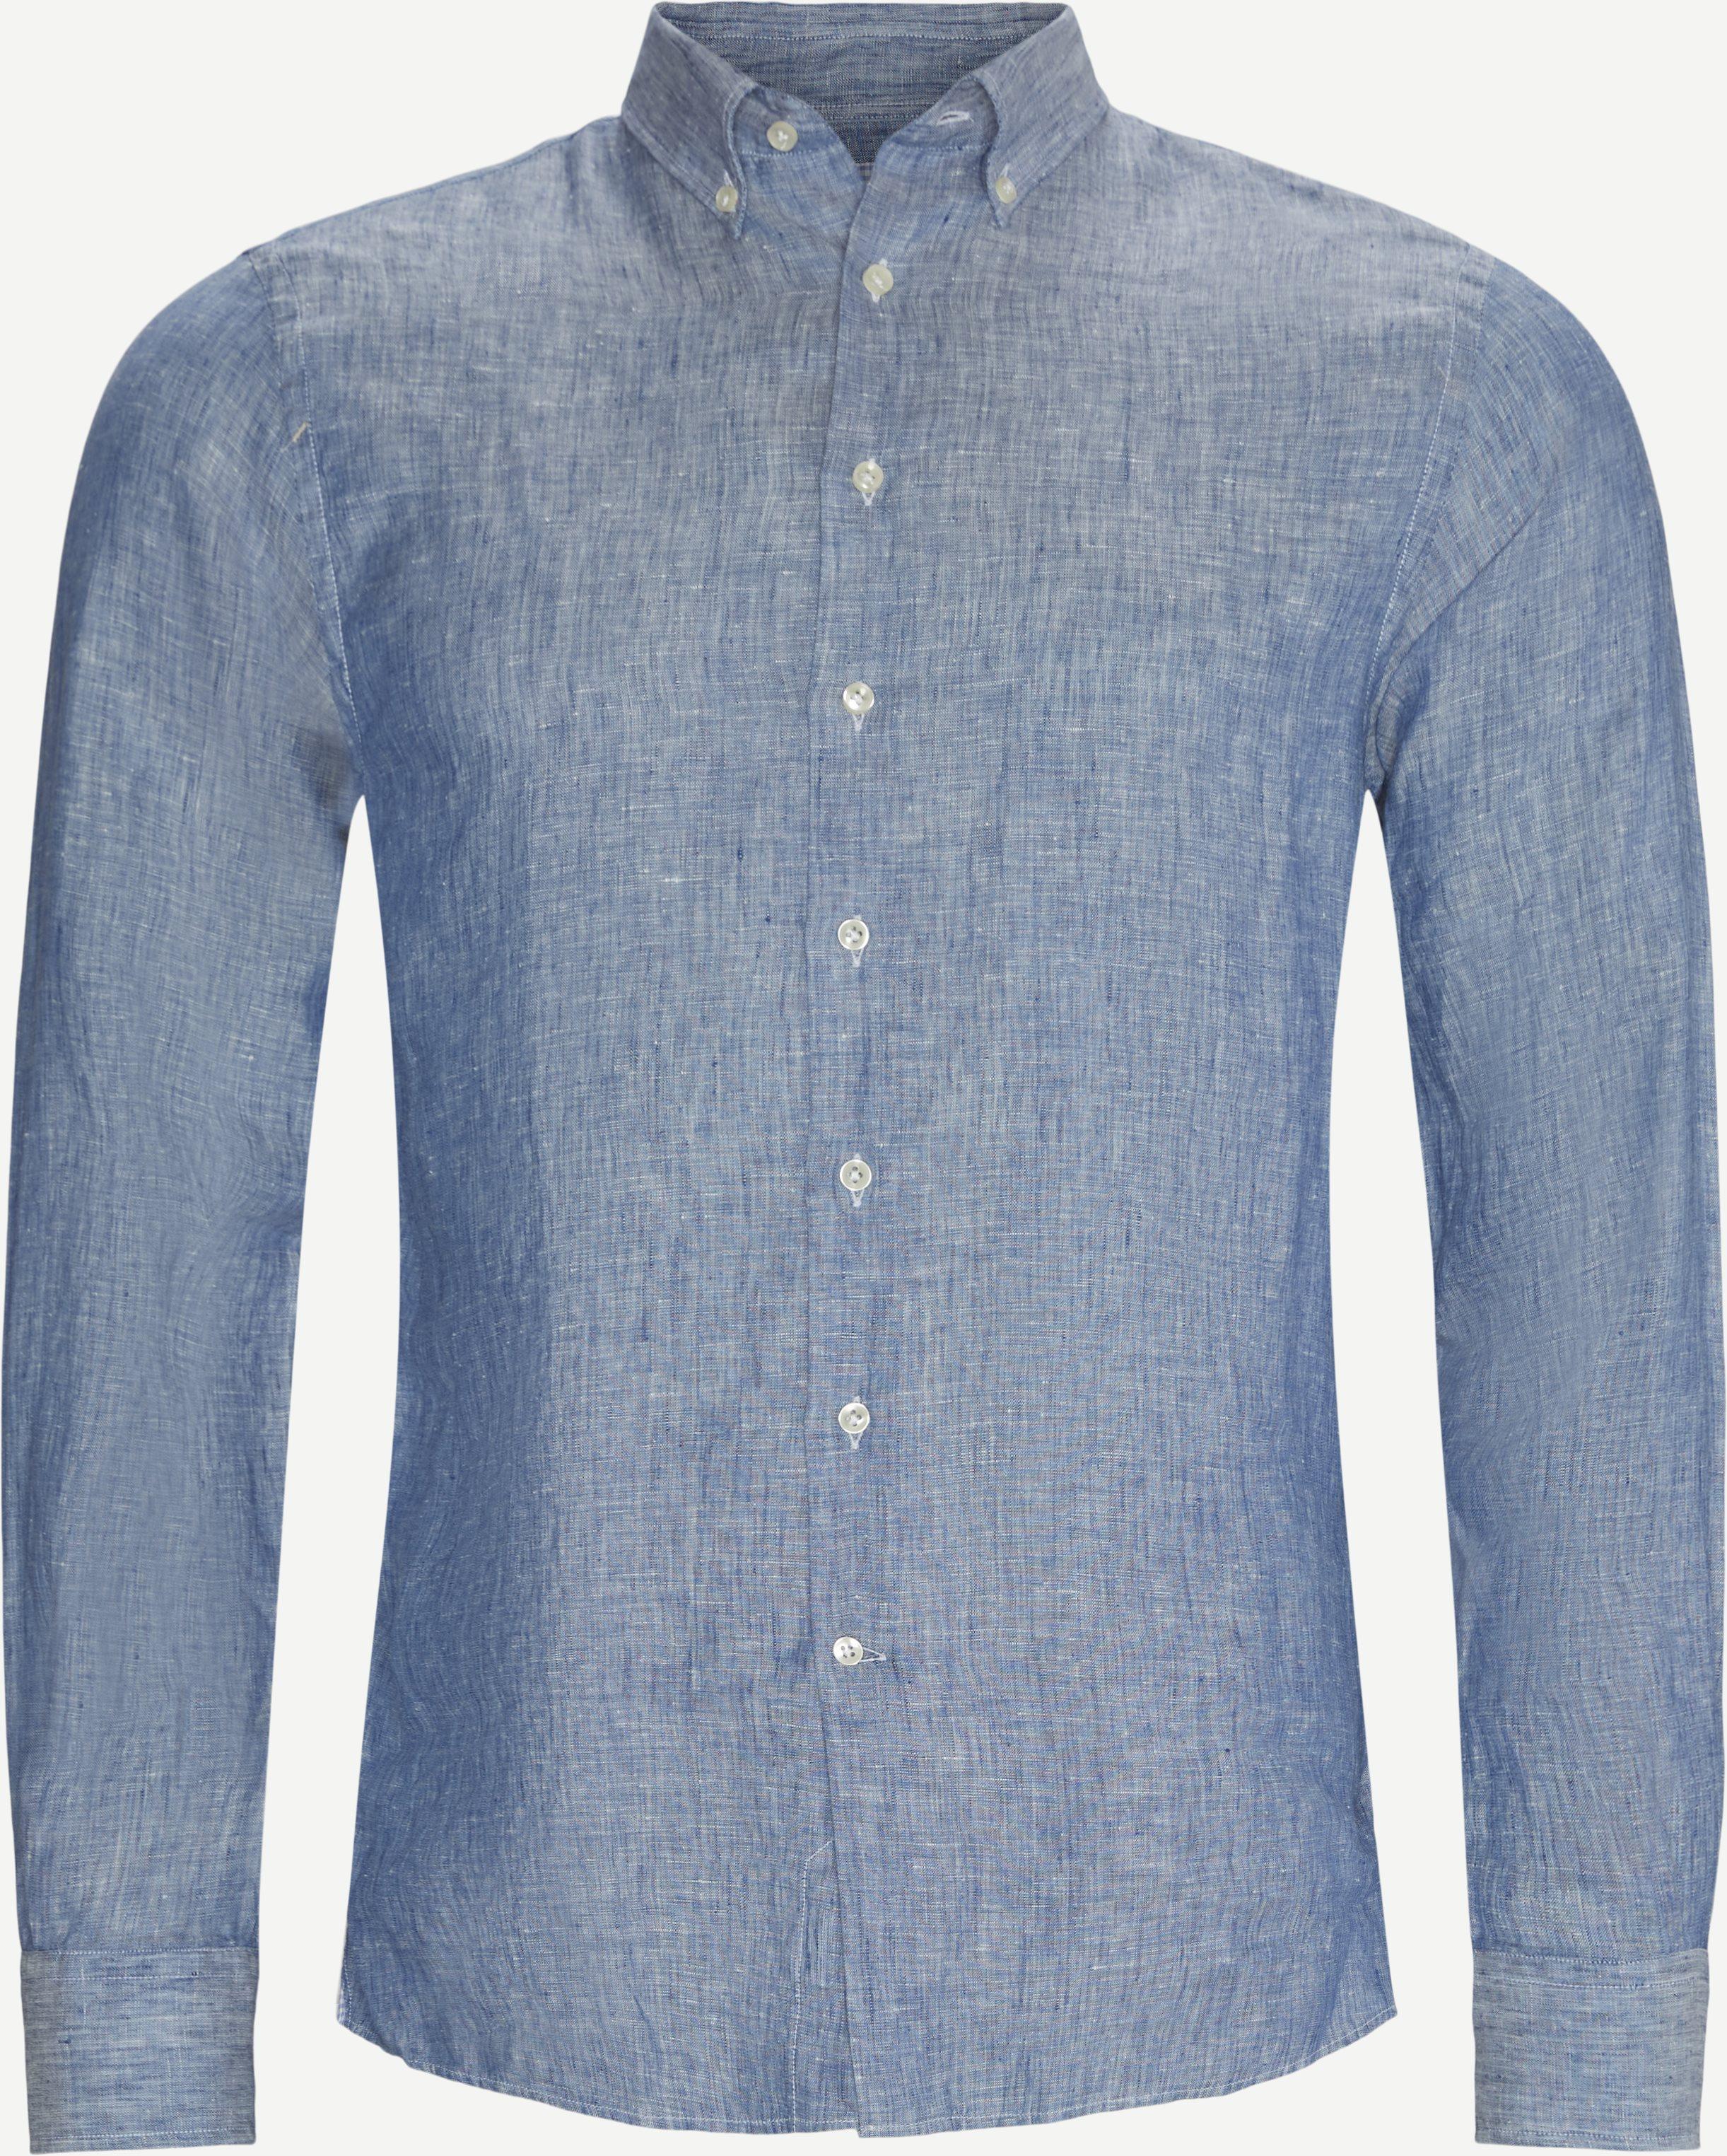 Summer Linen Skjorte - Shirts - Regular - Blue